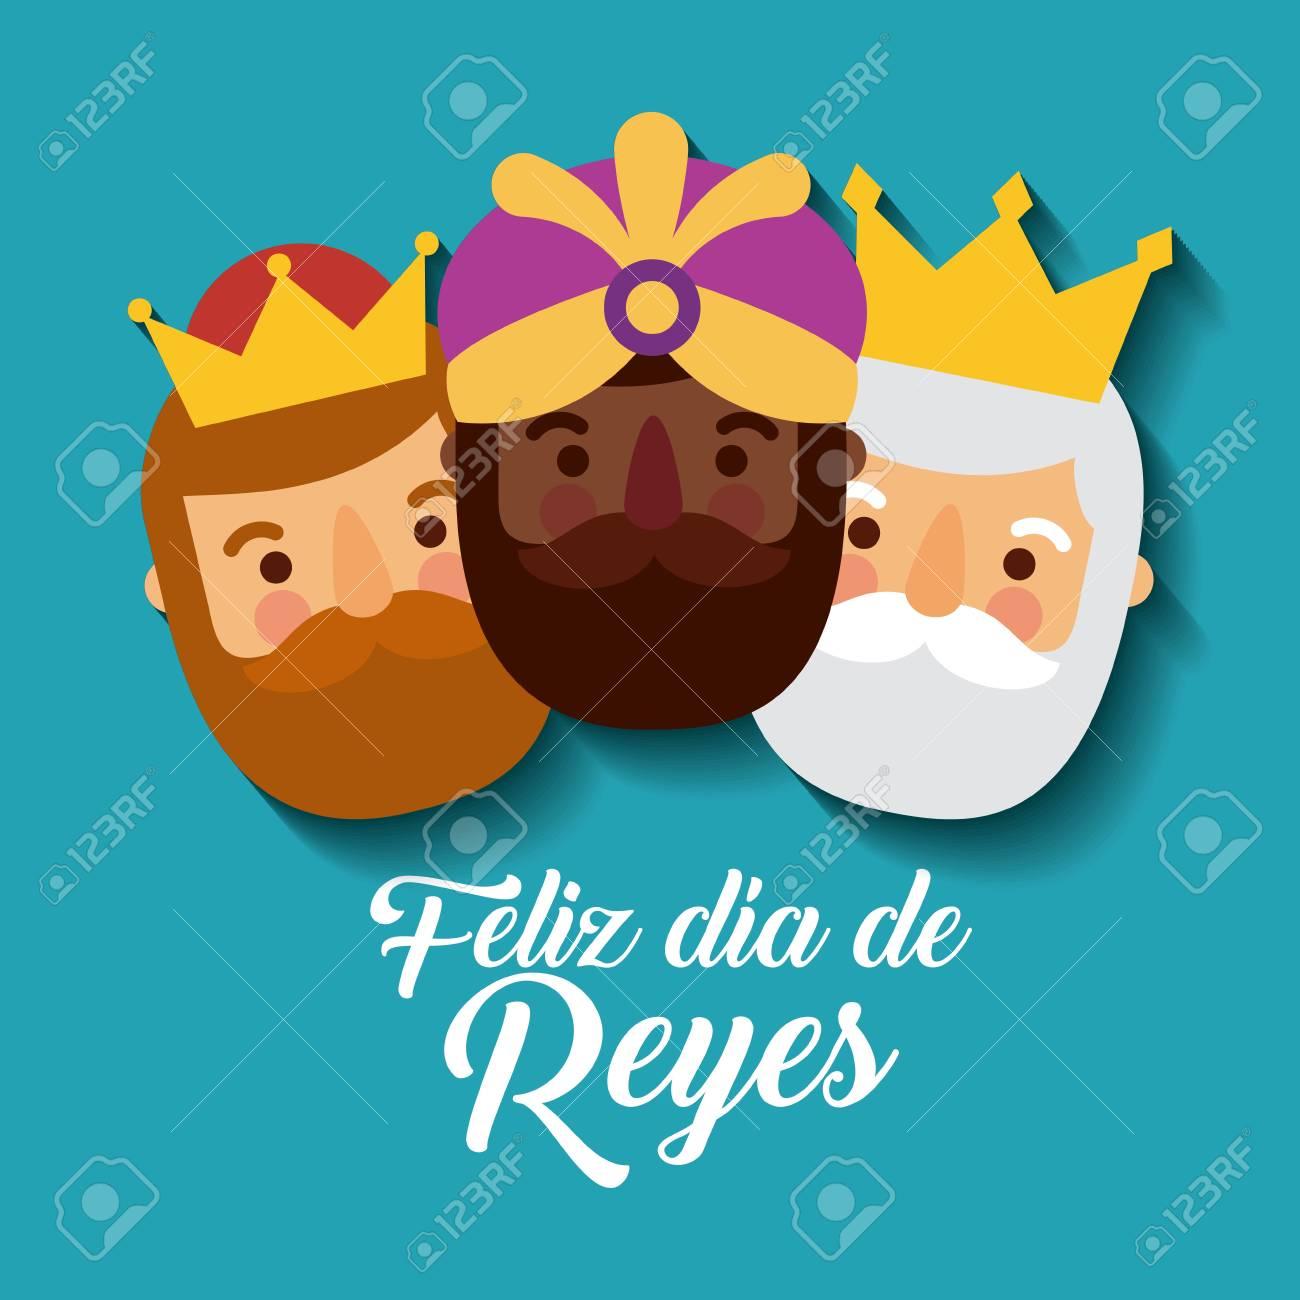 Feliz Dia De Los Reyes Drei Magische Könige Bringen Geschenke Nach